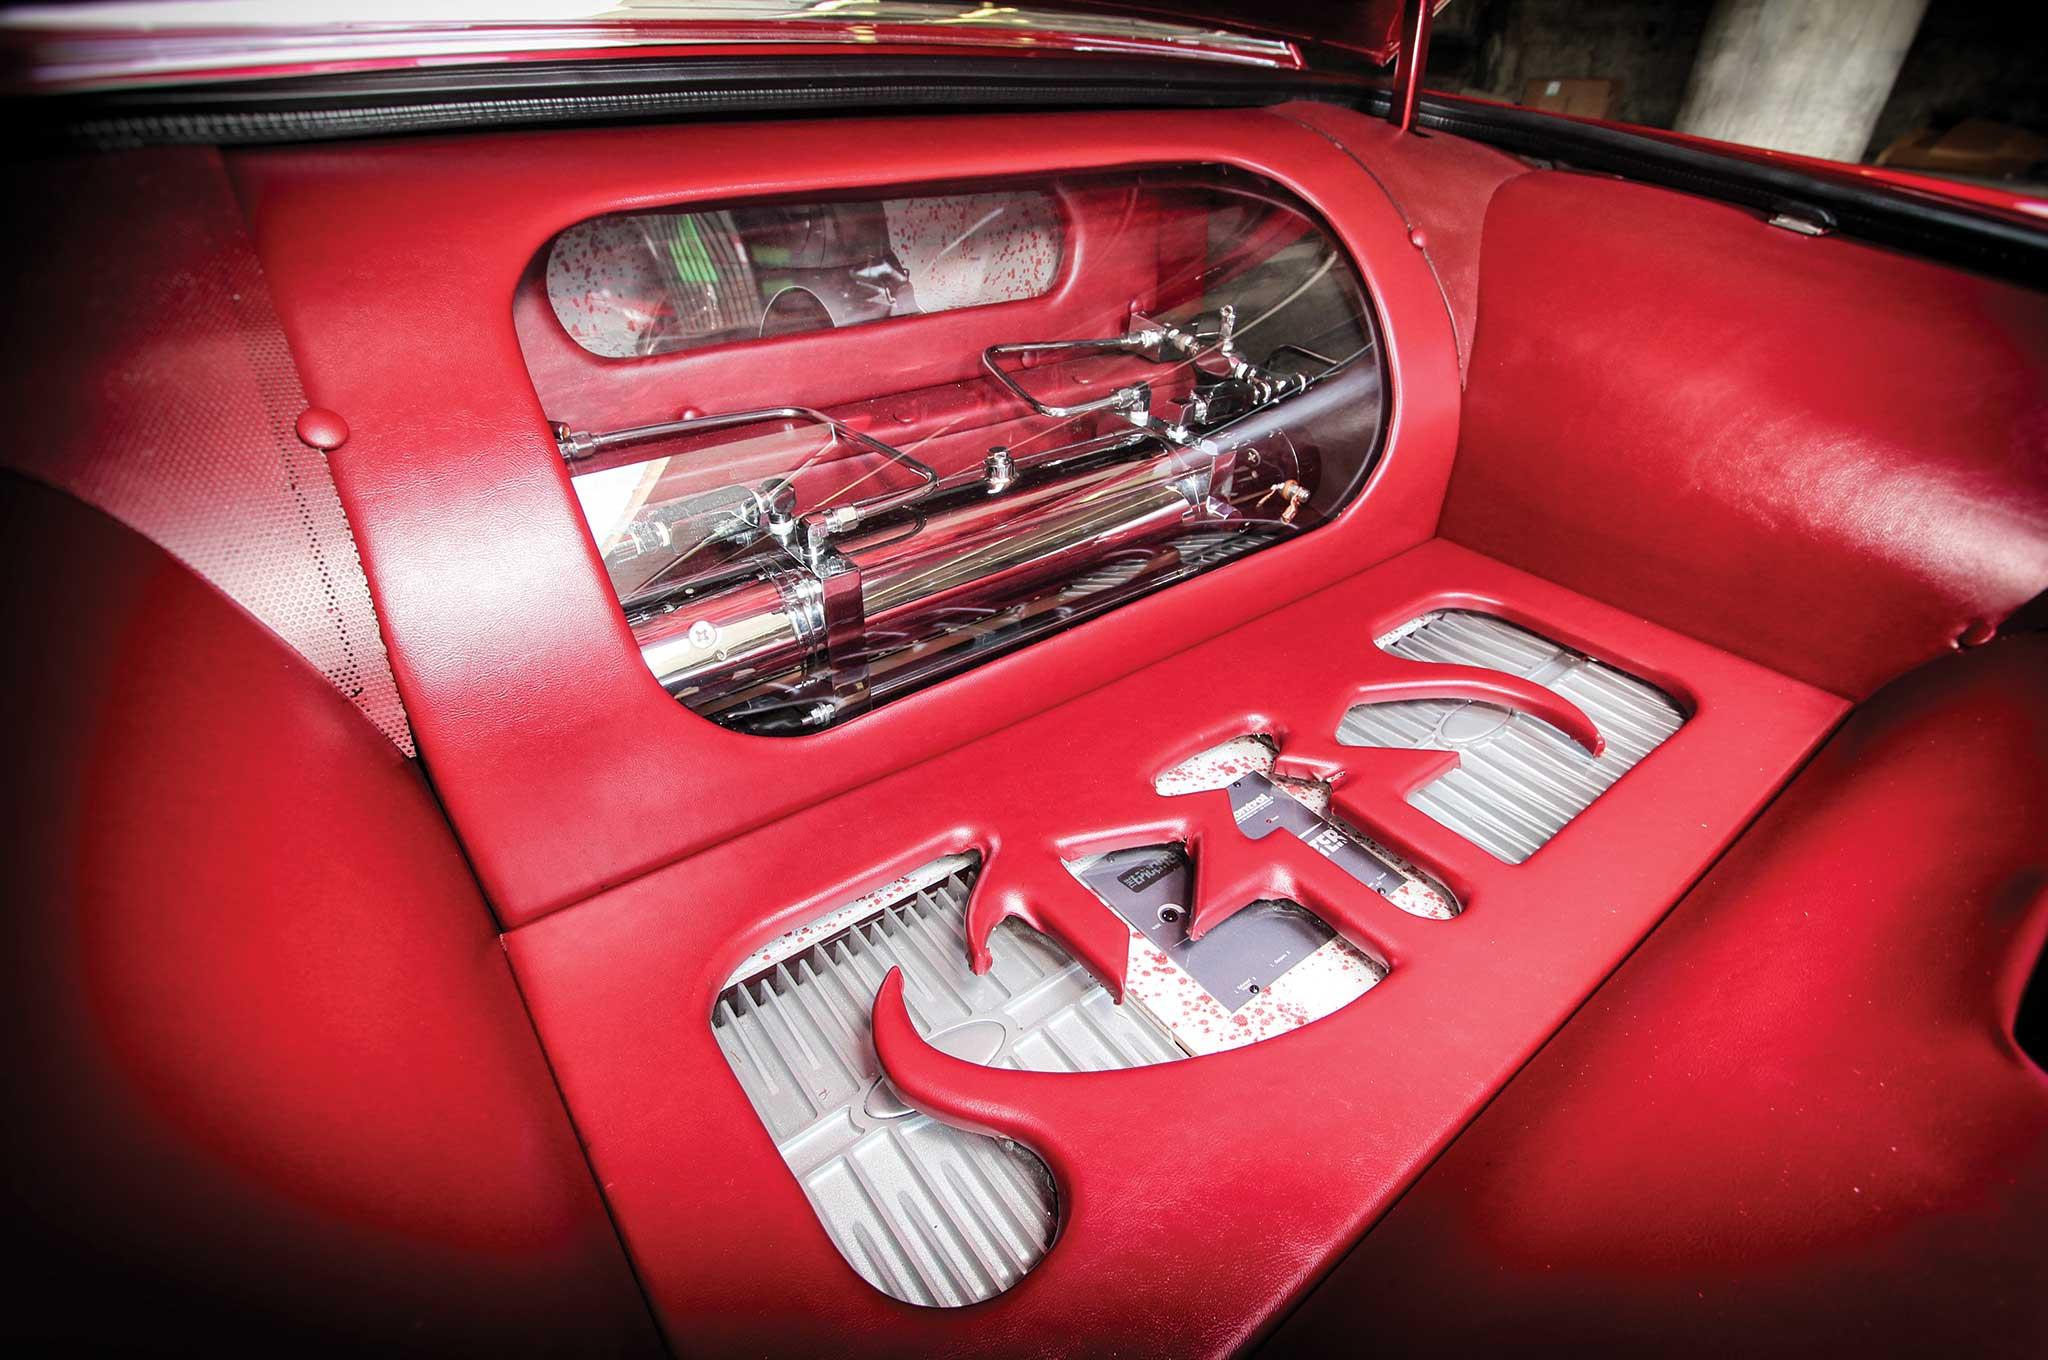 1983 cadillac coupe deville chrome whammy tank 005